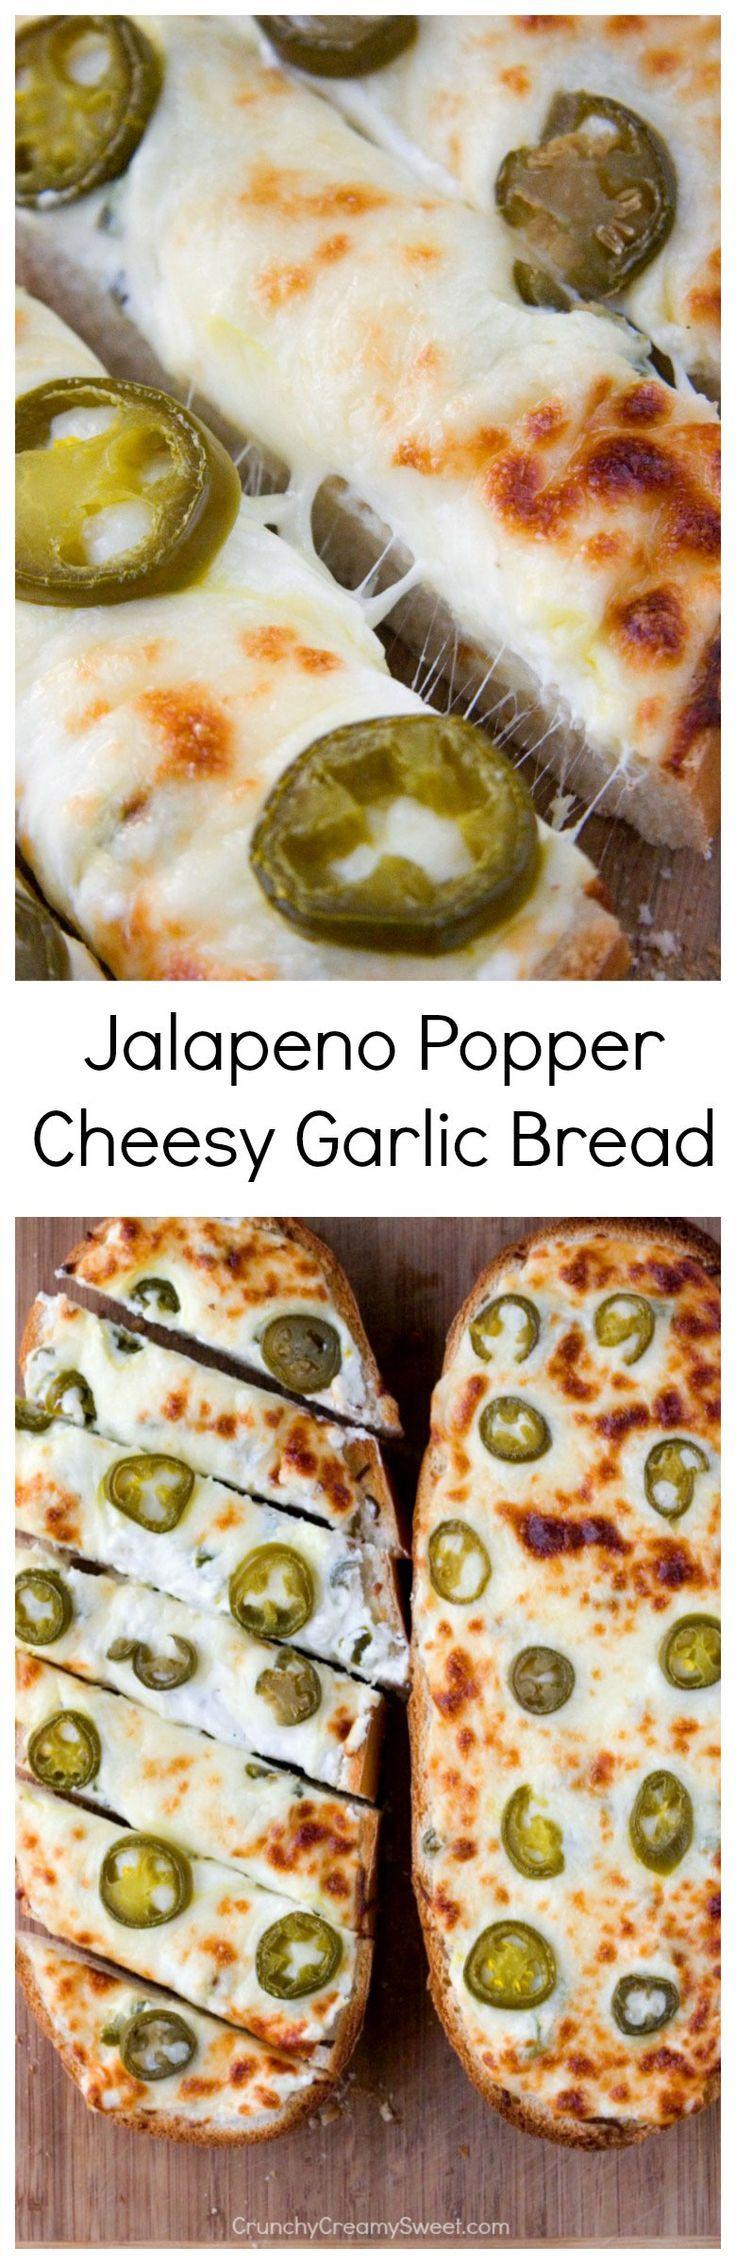 Jalapeno Popper Cheesy Garlic Bread 25+ Game Day Foods   NoBiggie.net